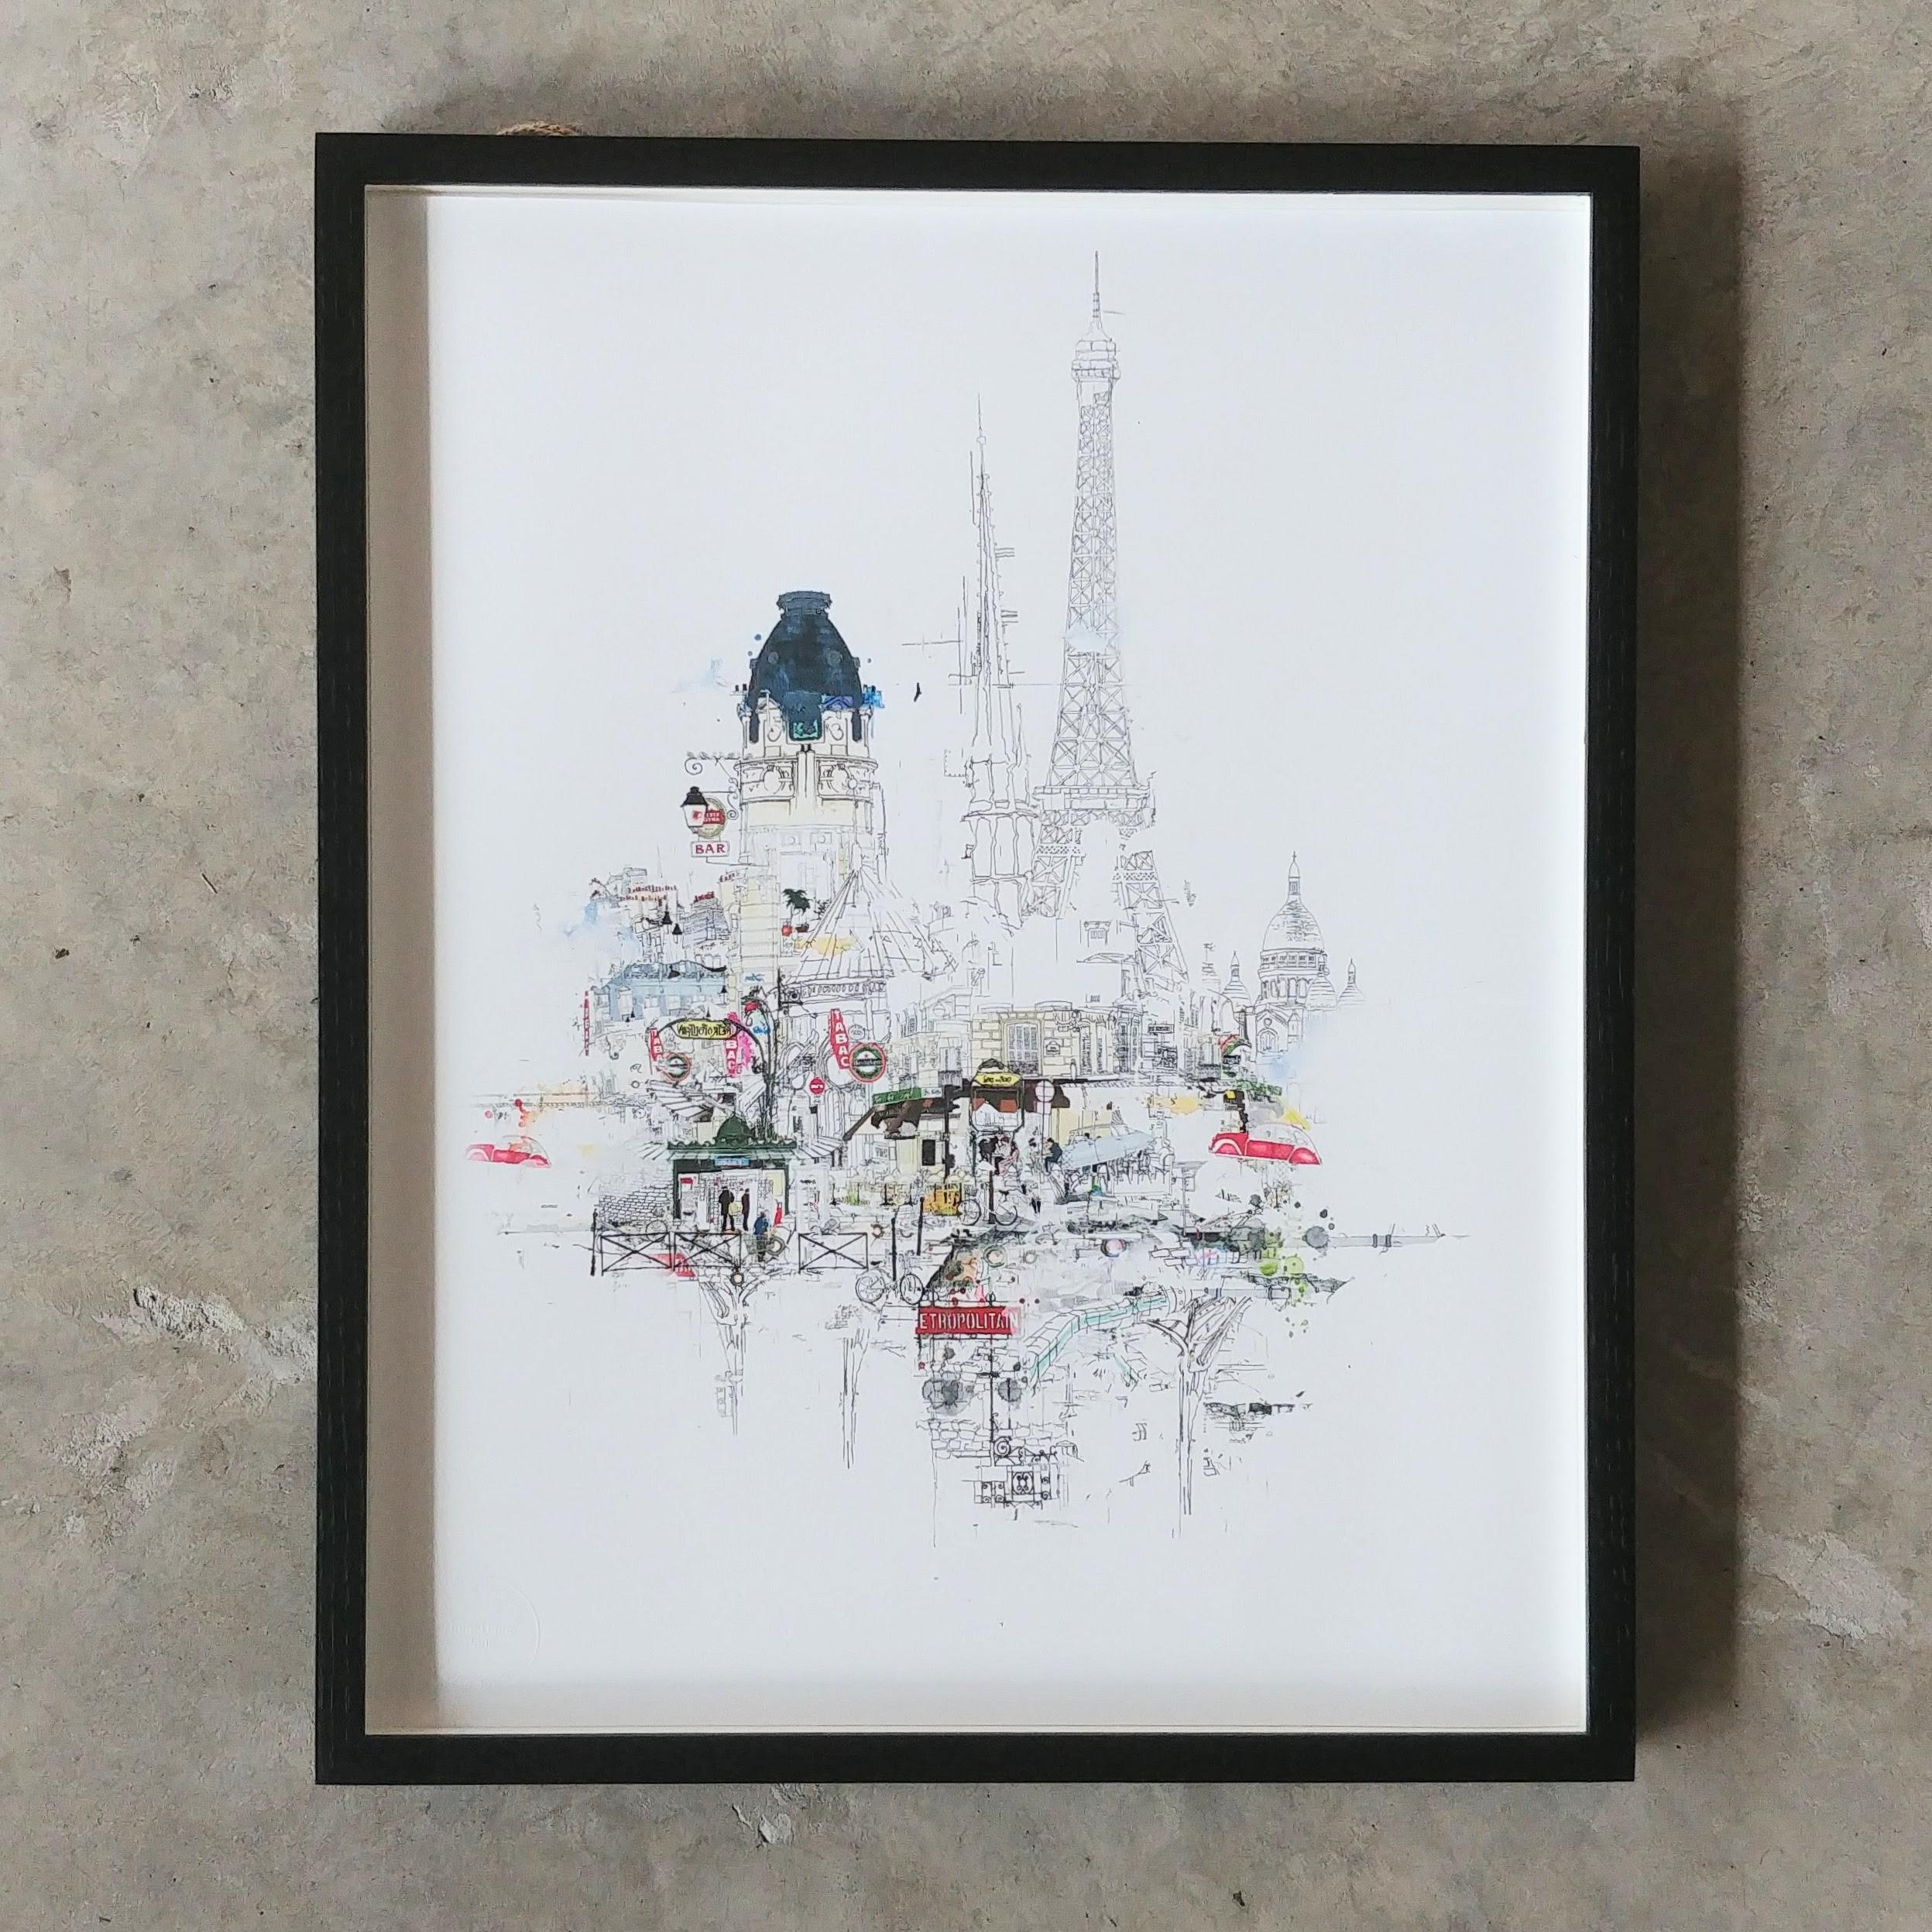 Laura Jordan Notre Dame (framed)